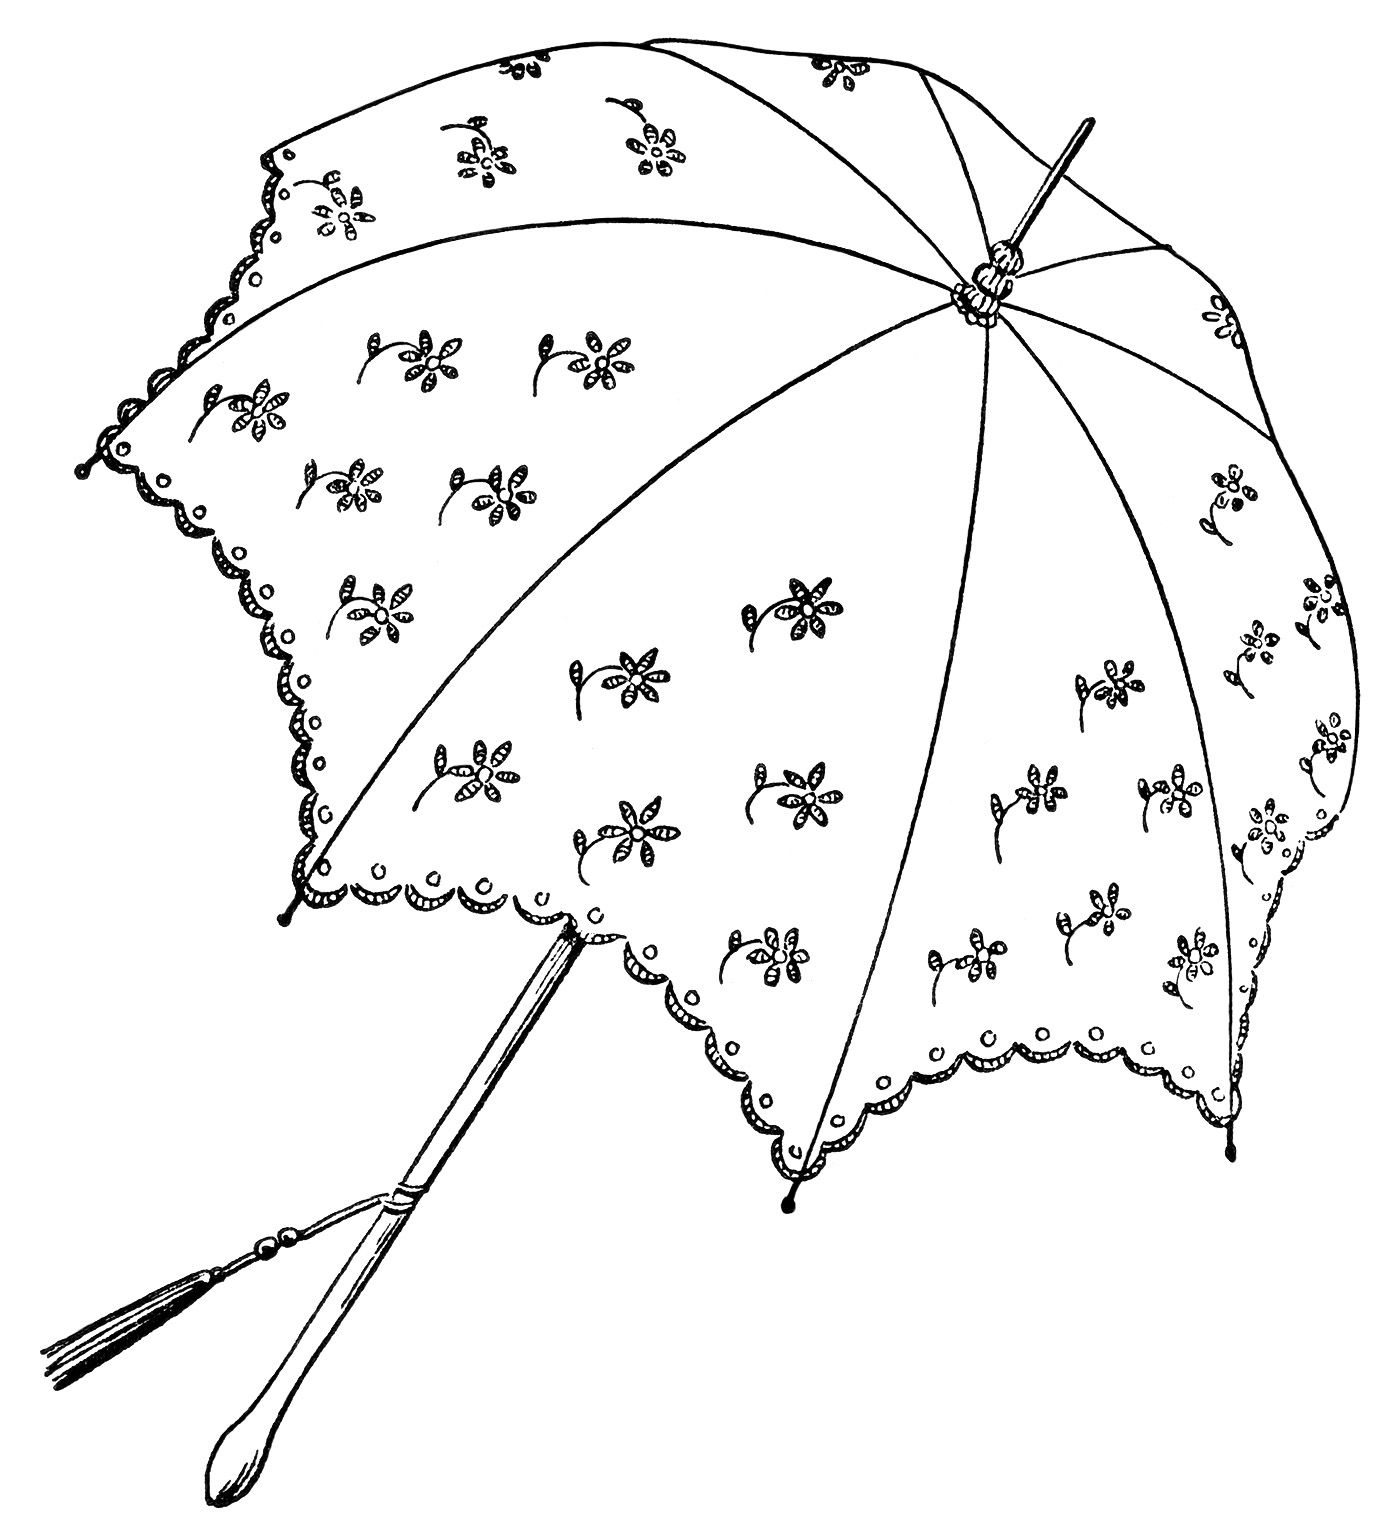 Vintage parasol clipart black and white graphics umbrella clip art printable parasol illustration public domain umbrella